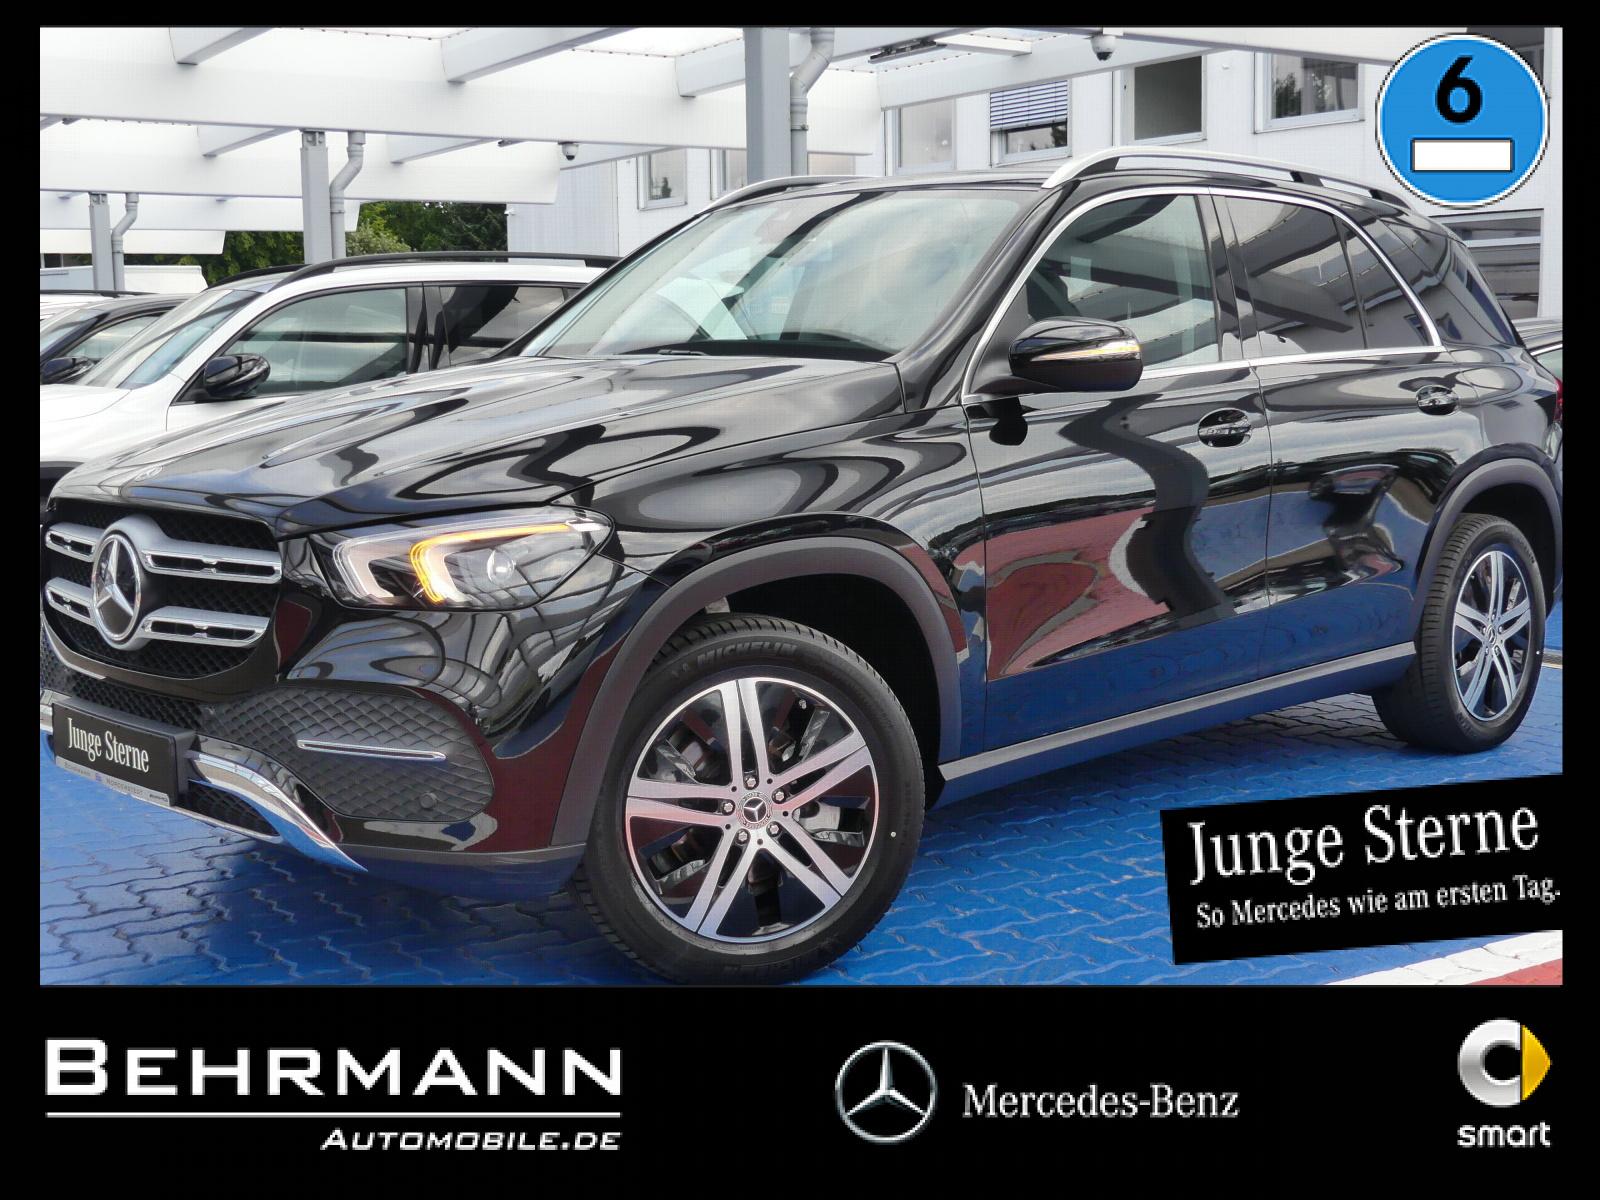 Mercedes-Benz GLE 300d 4M Exclusive StdHzg.+7-Stizer+Burmester, Jahr 2019, Diesel